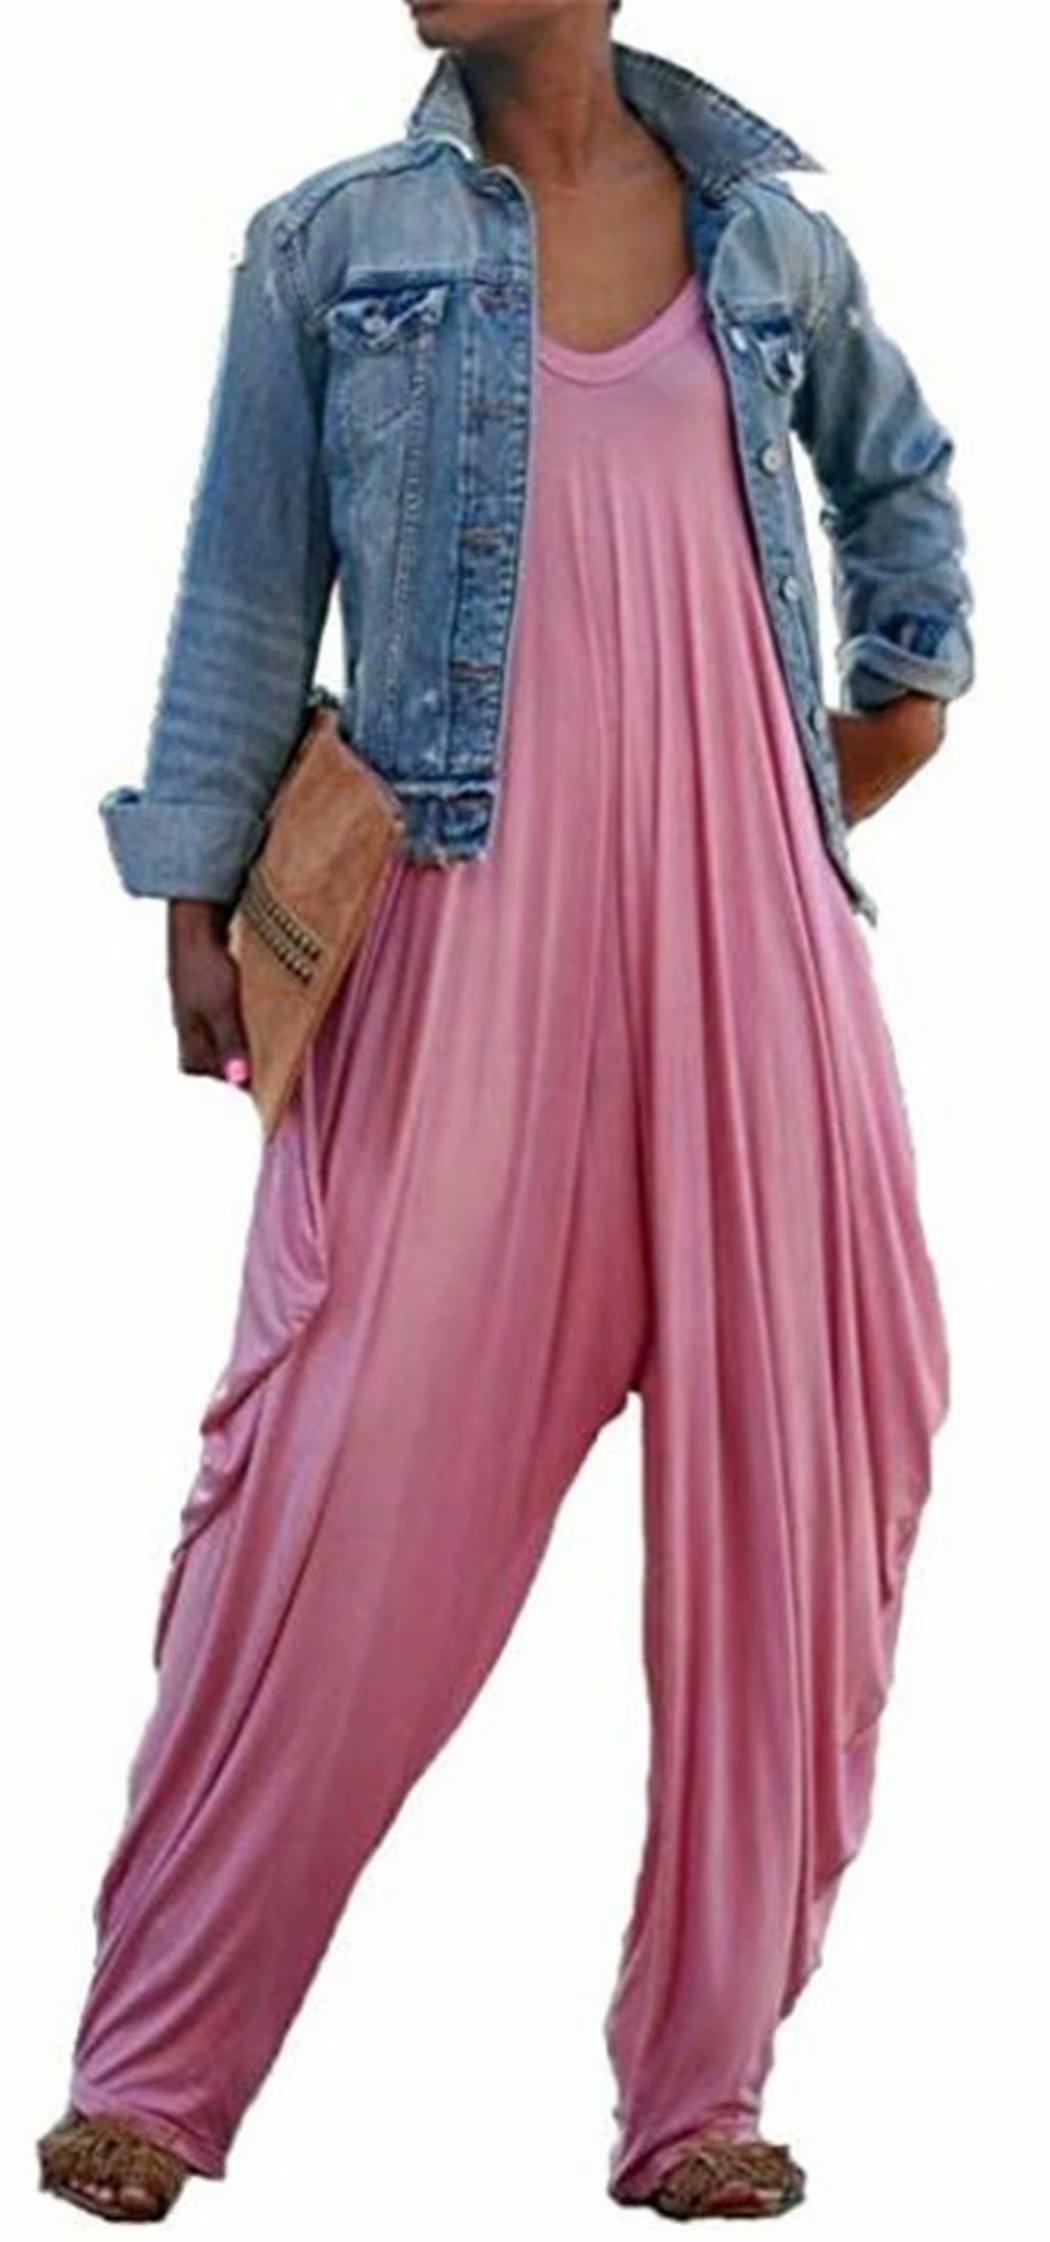 JINTING Women V Neck Spaghetti Strap Wide Leg Long Pant Casual Loose Harem One Piece Jumpsuit Romper Plus Size Size L (Pink)